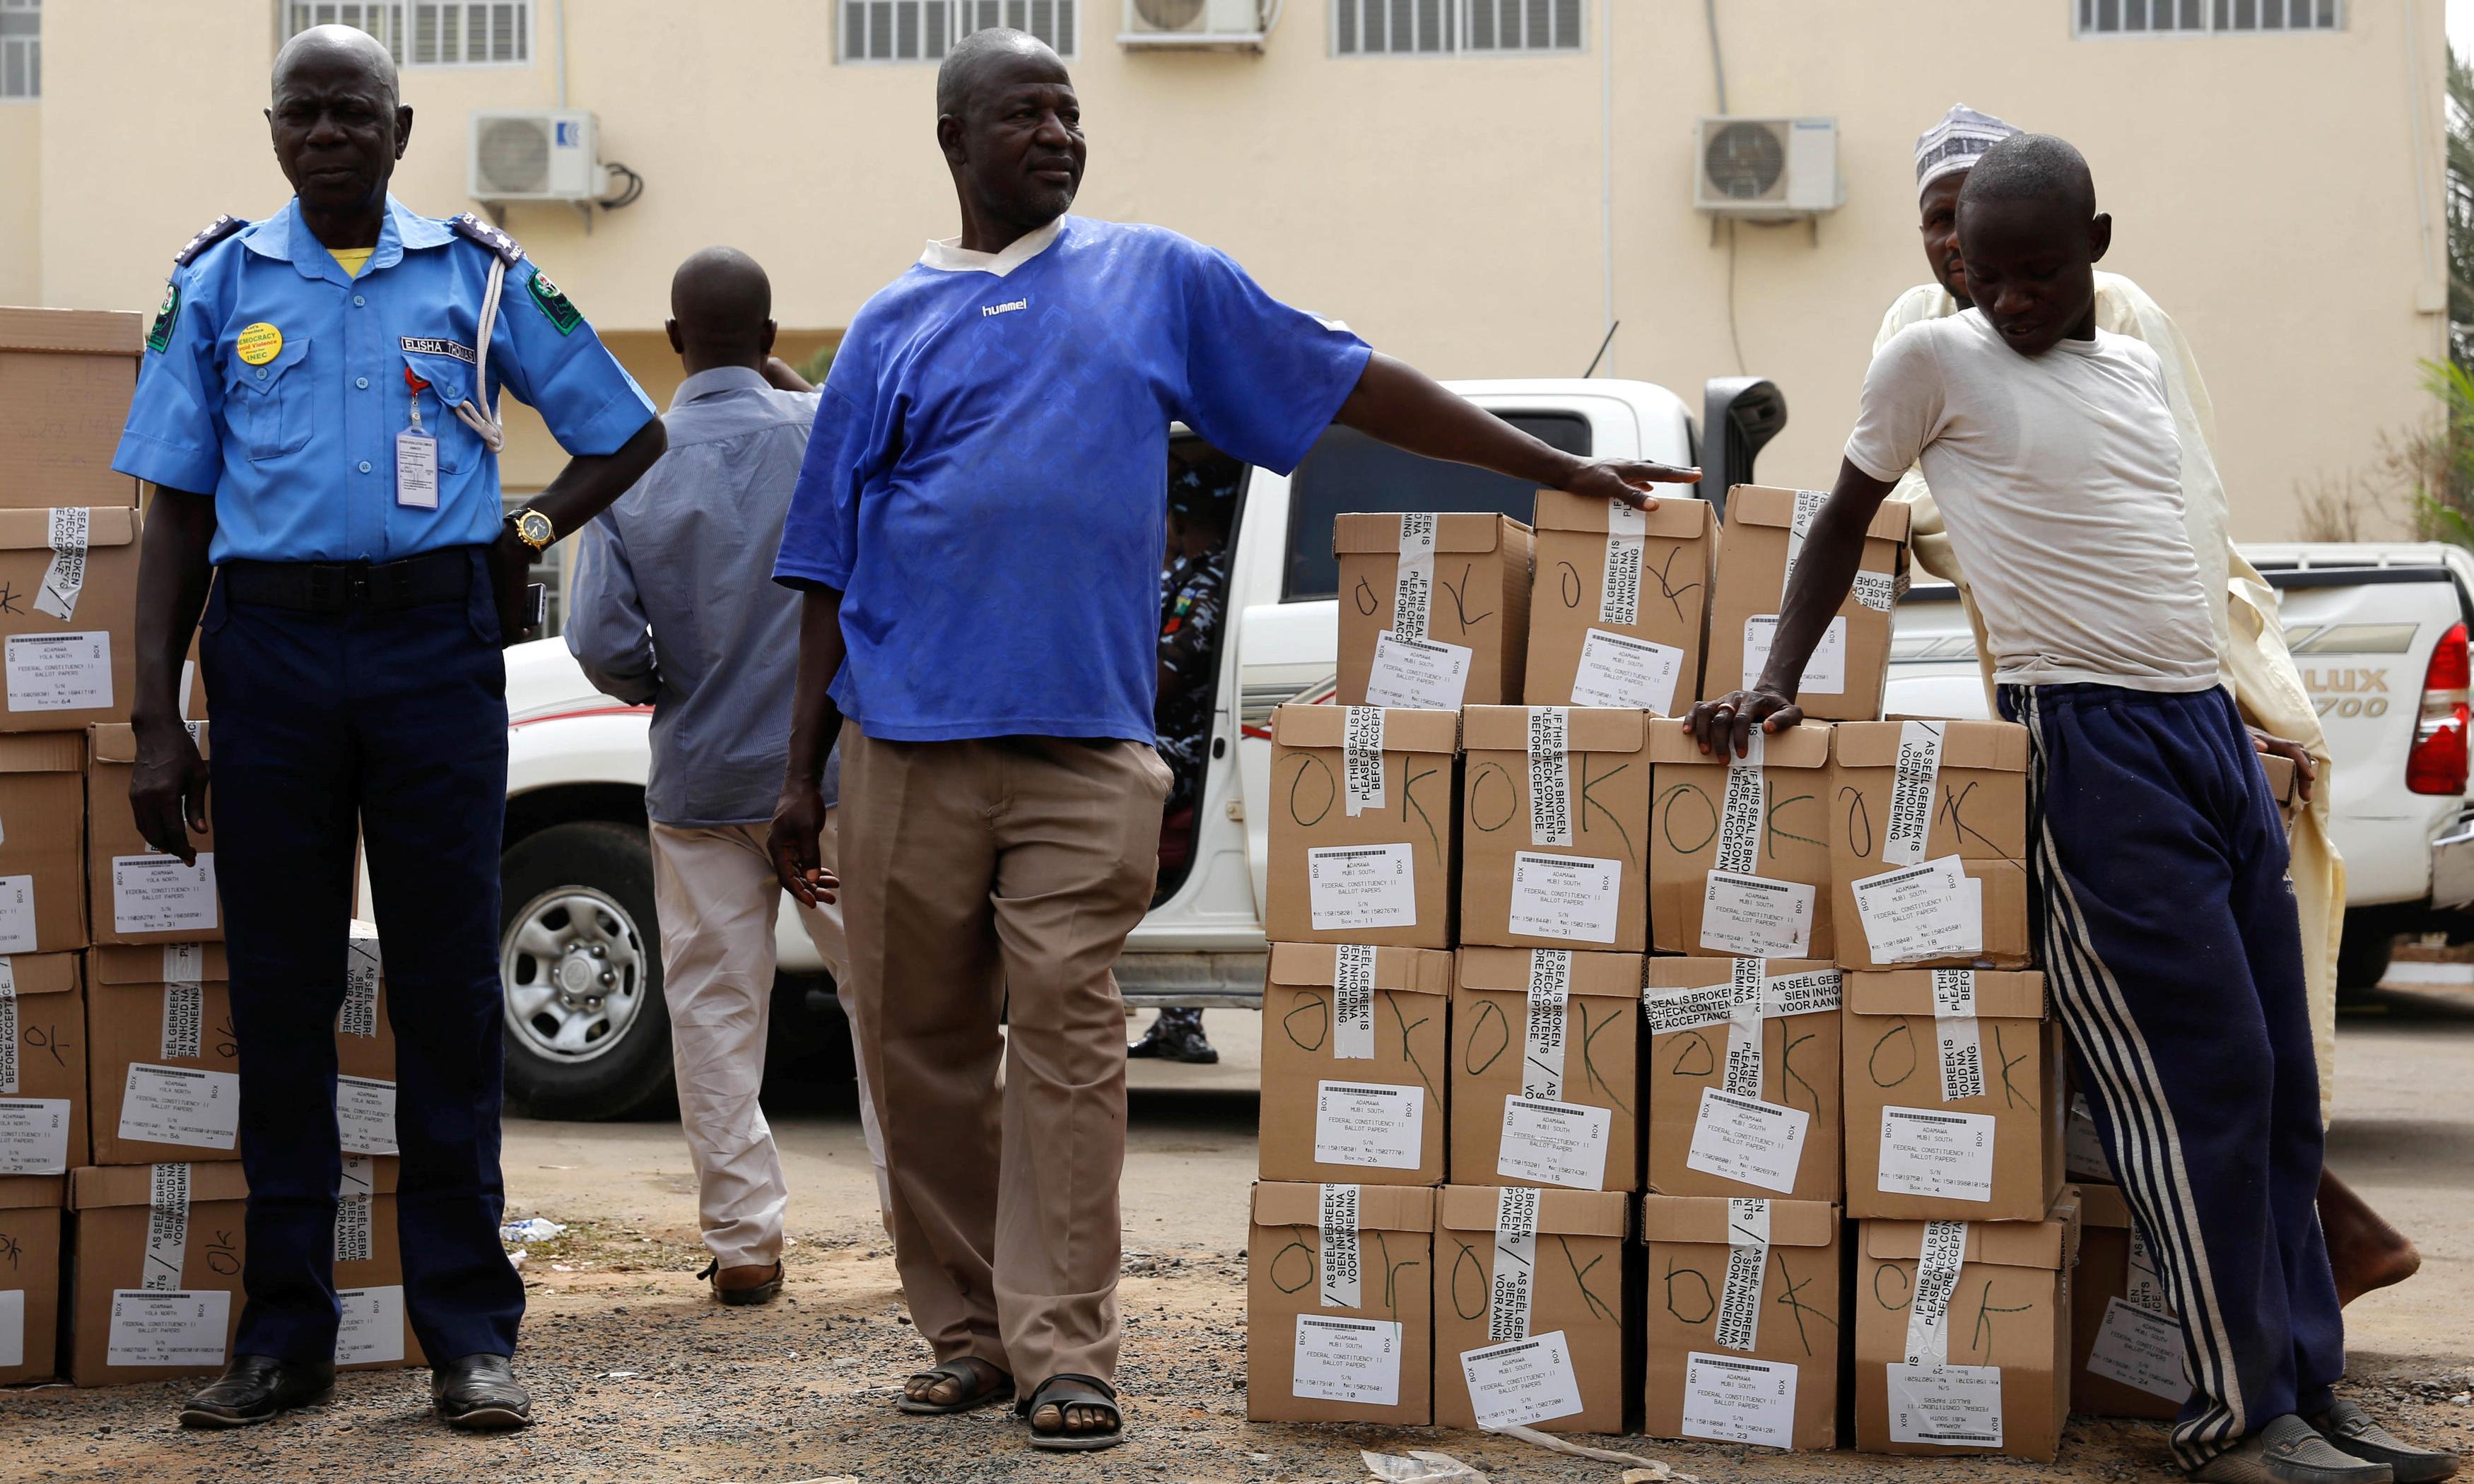 Nigeria postpones election just hours before polls due to open